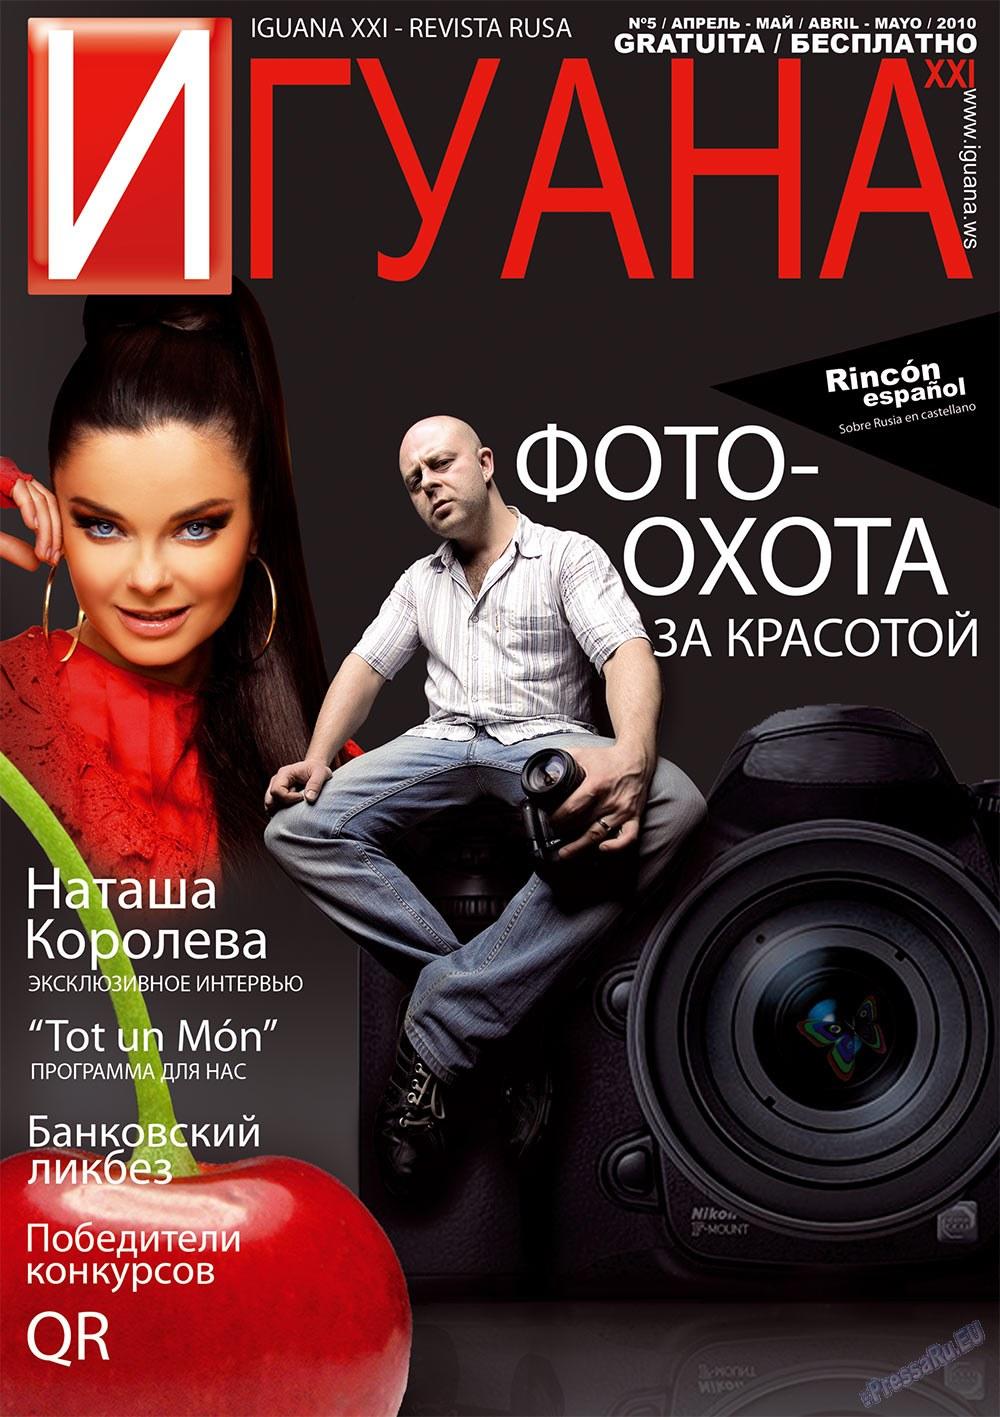 Игуана (журнал). 2010 год, номер 5, стр. 1